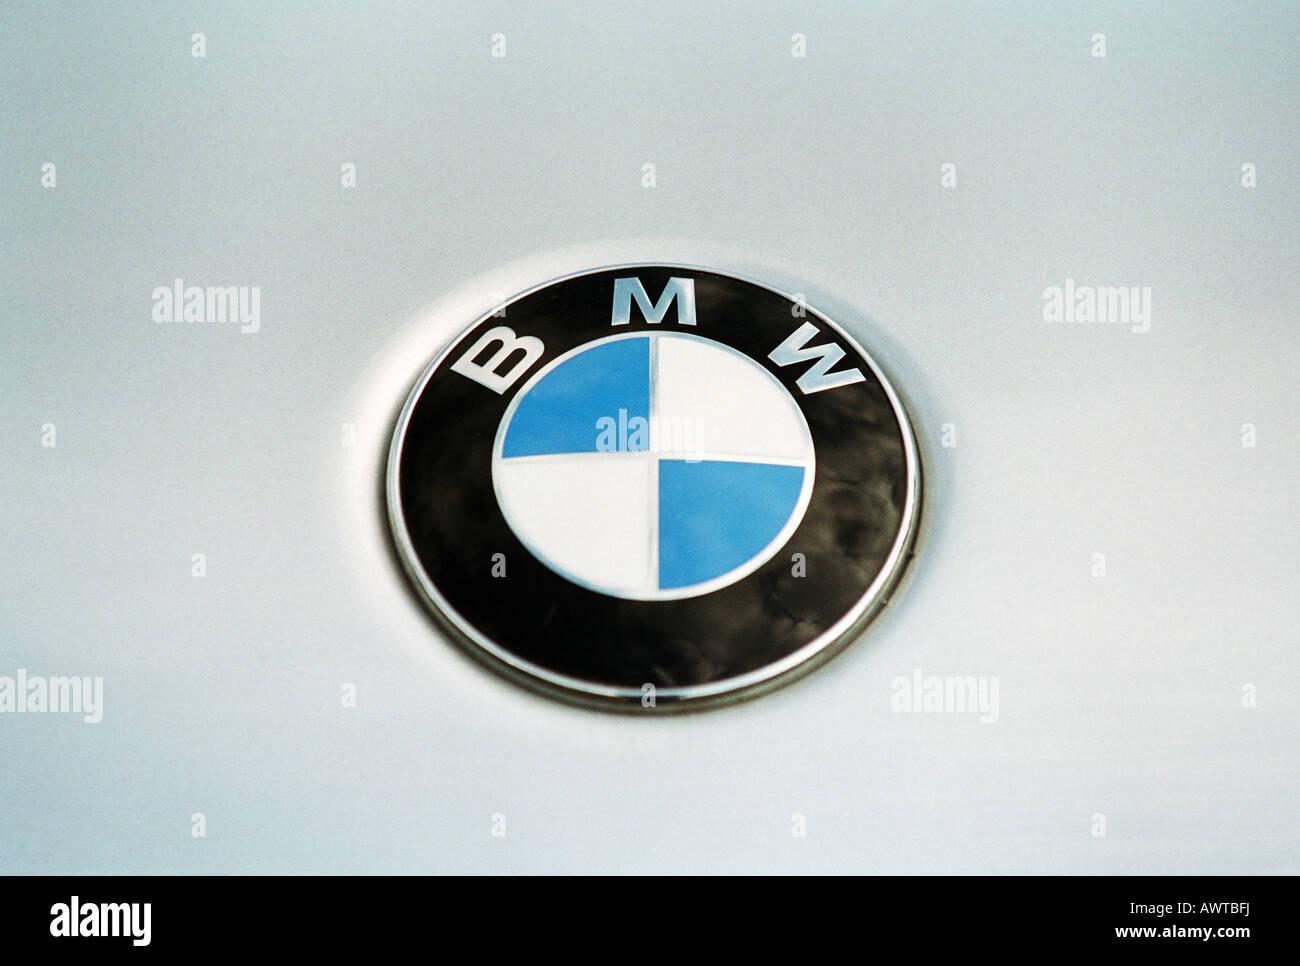 Bmw Group Sign Stock Photos Bmw Group Sign Stock Images Alamy